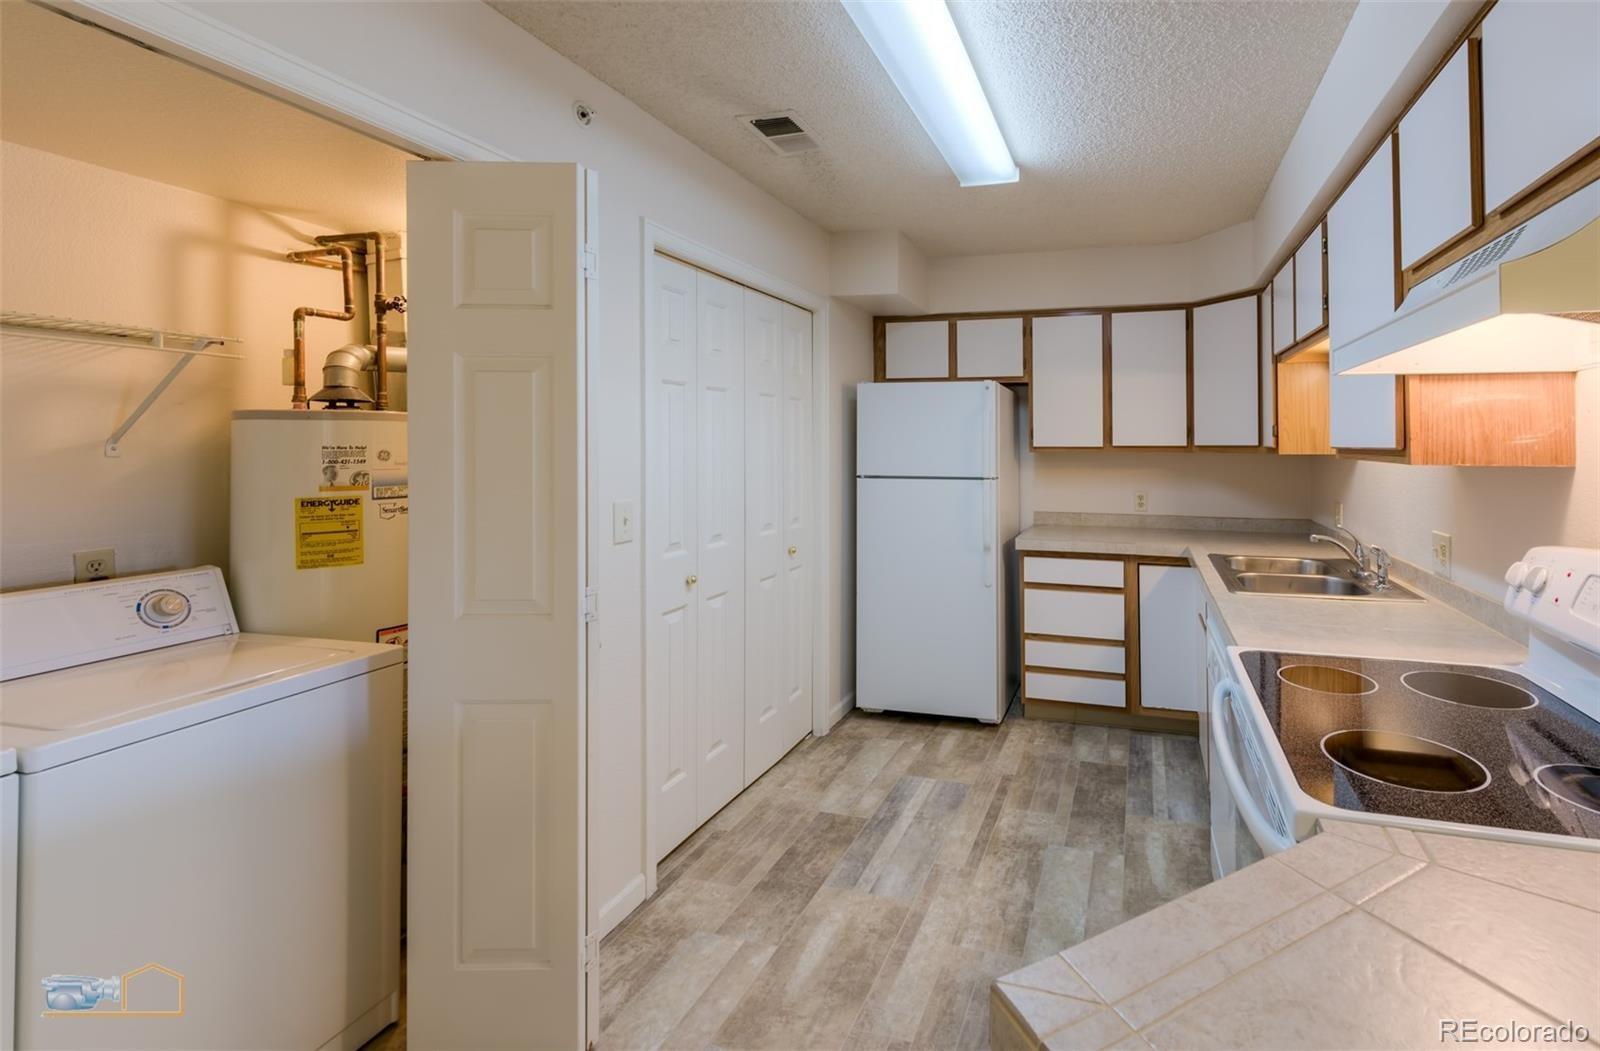 MLS# 6046314 - 10 - 4870 Twin Lakes Road #8, Boulder, CO 80301